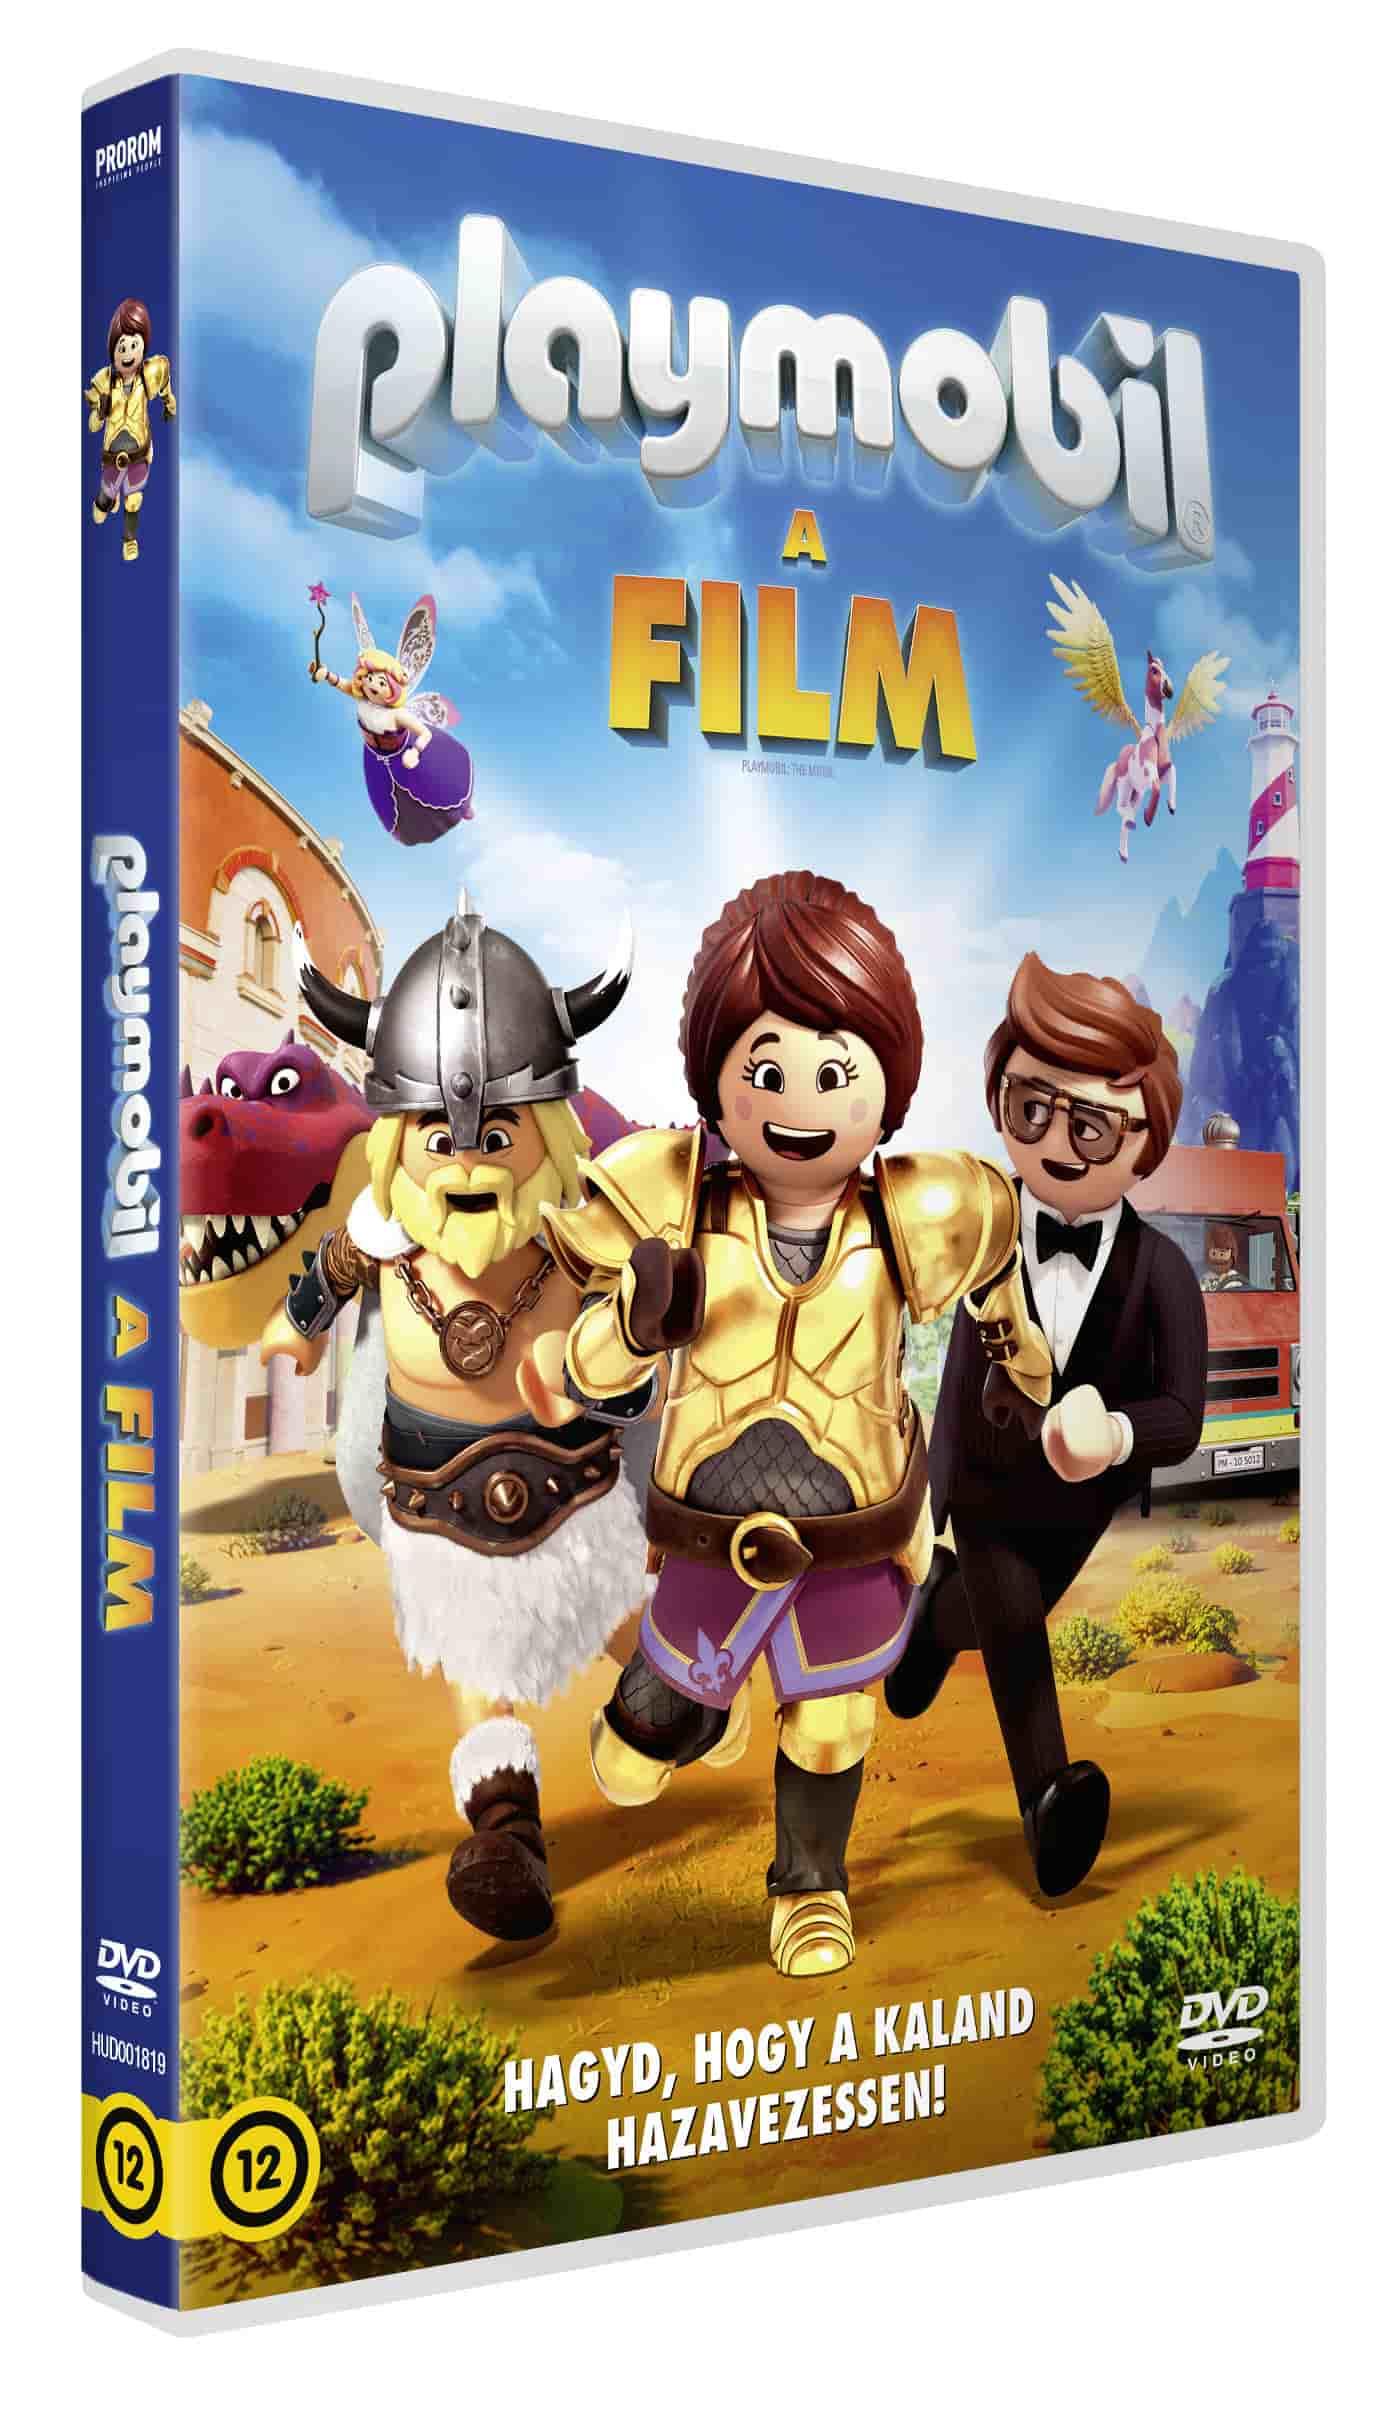 Playmobil: A Film - DVD